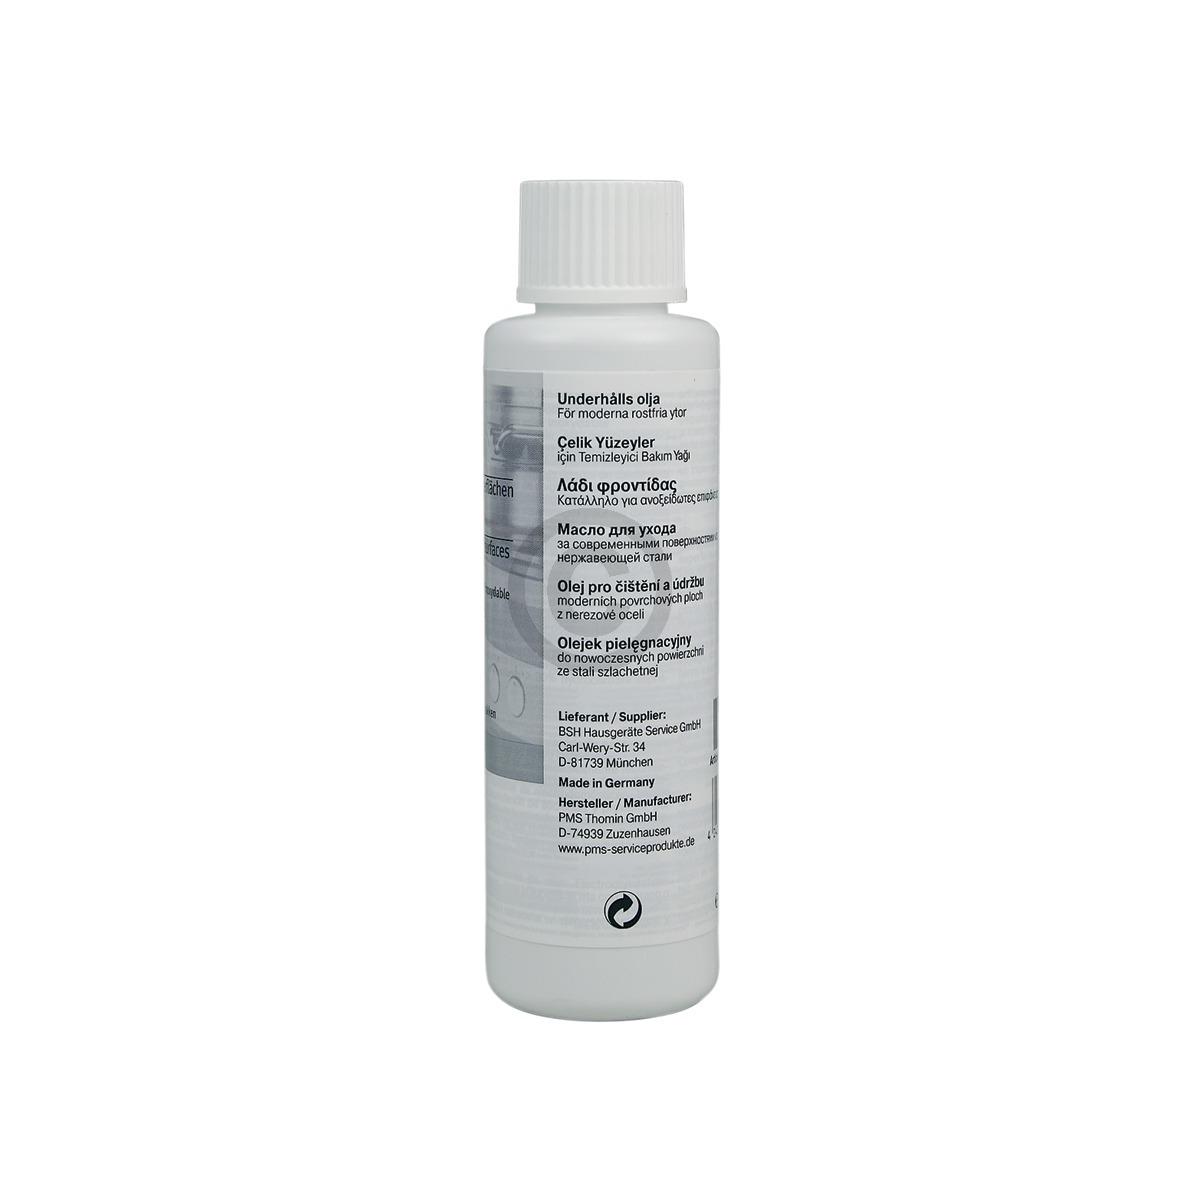 Edelstahlpflege Öl BSH protect 100ml 00311135 311135 Bosch, Siemens, Neff